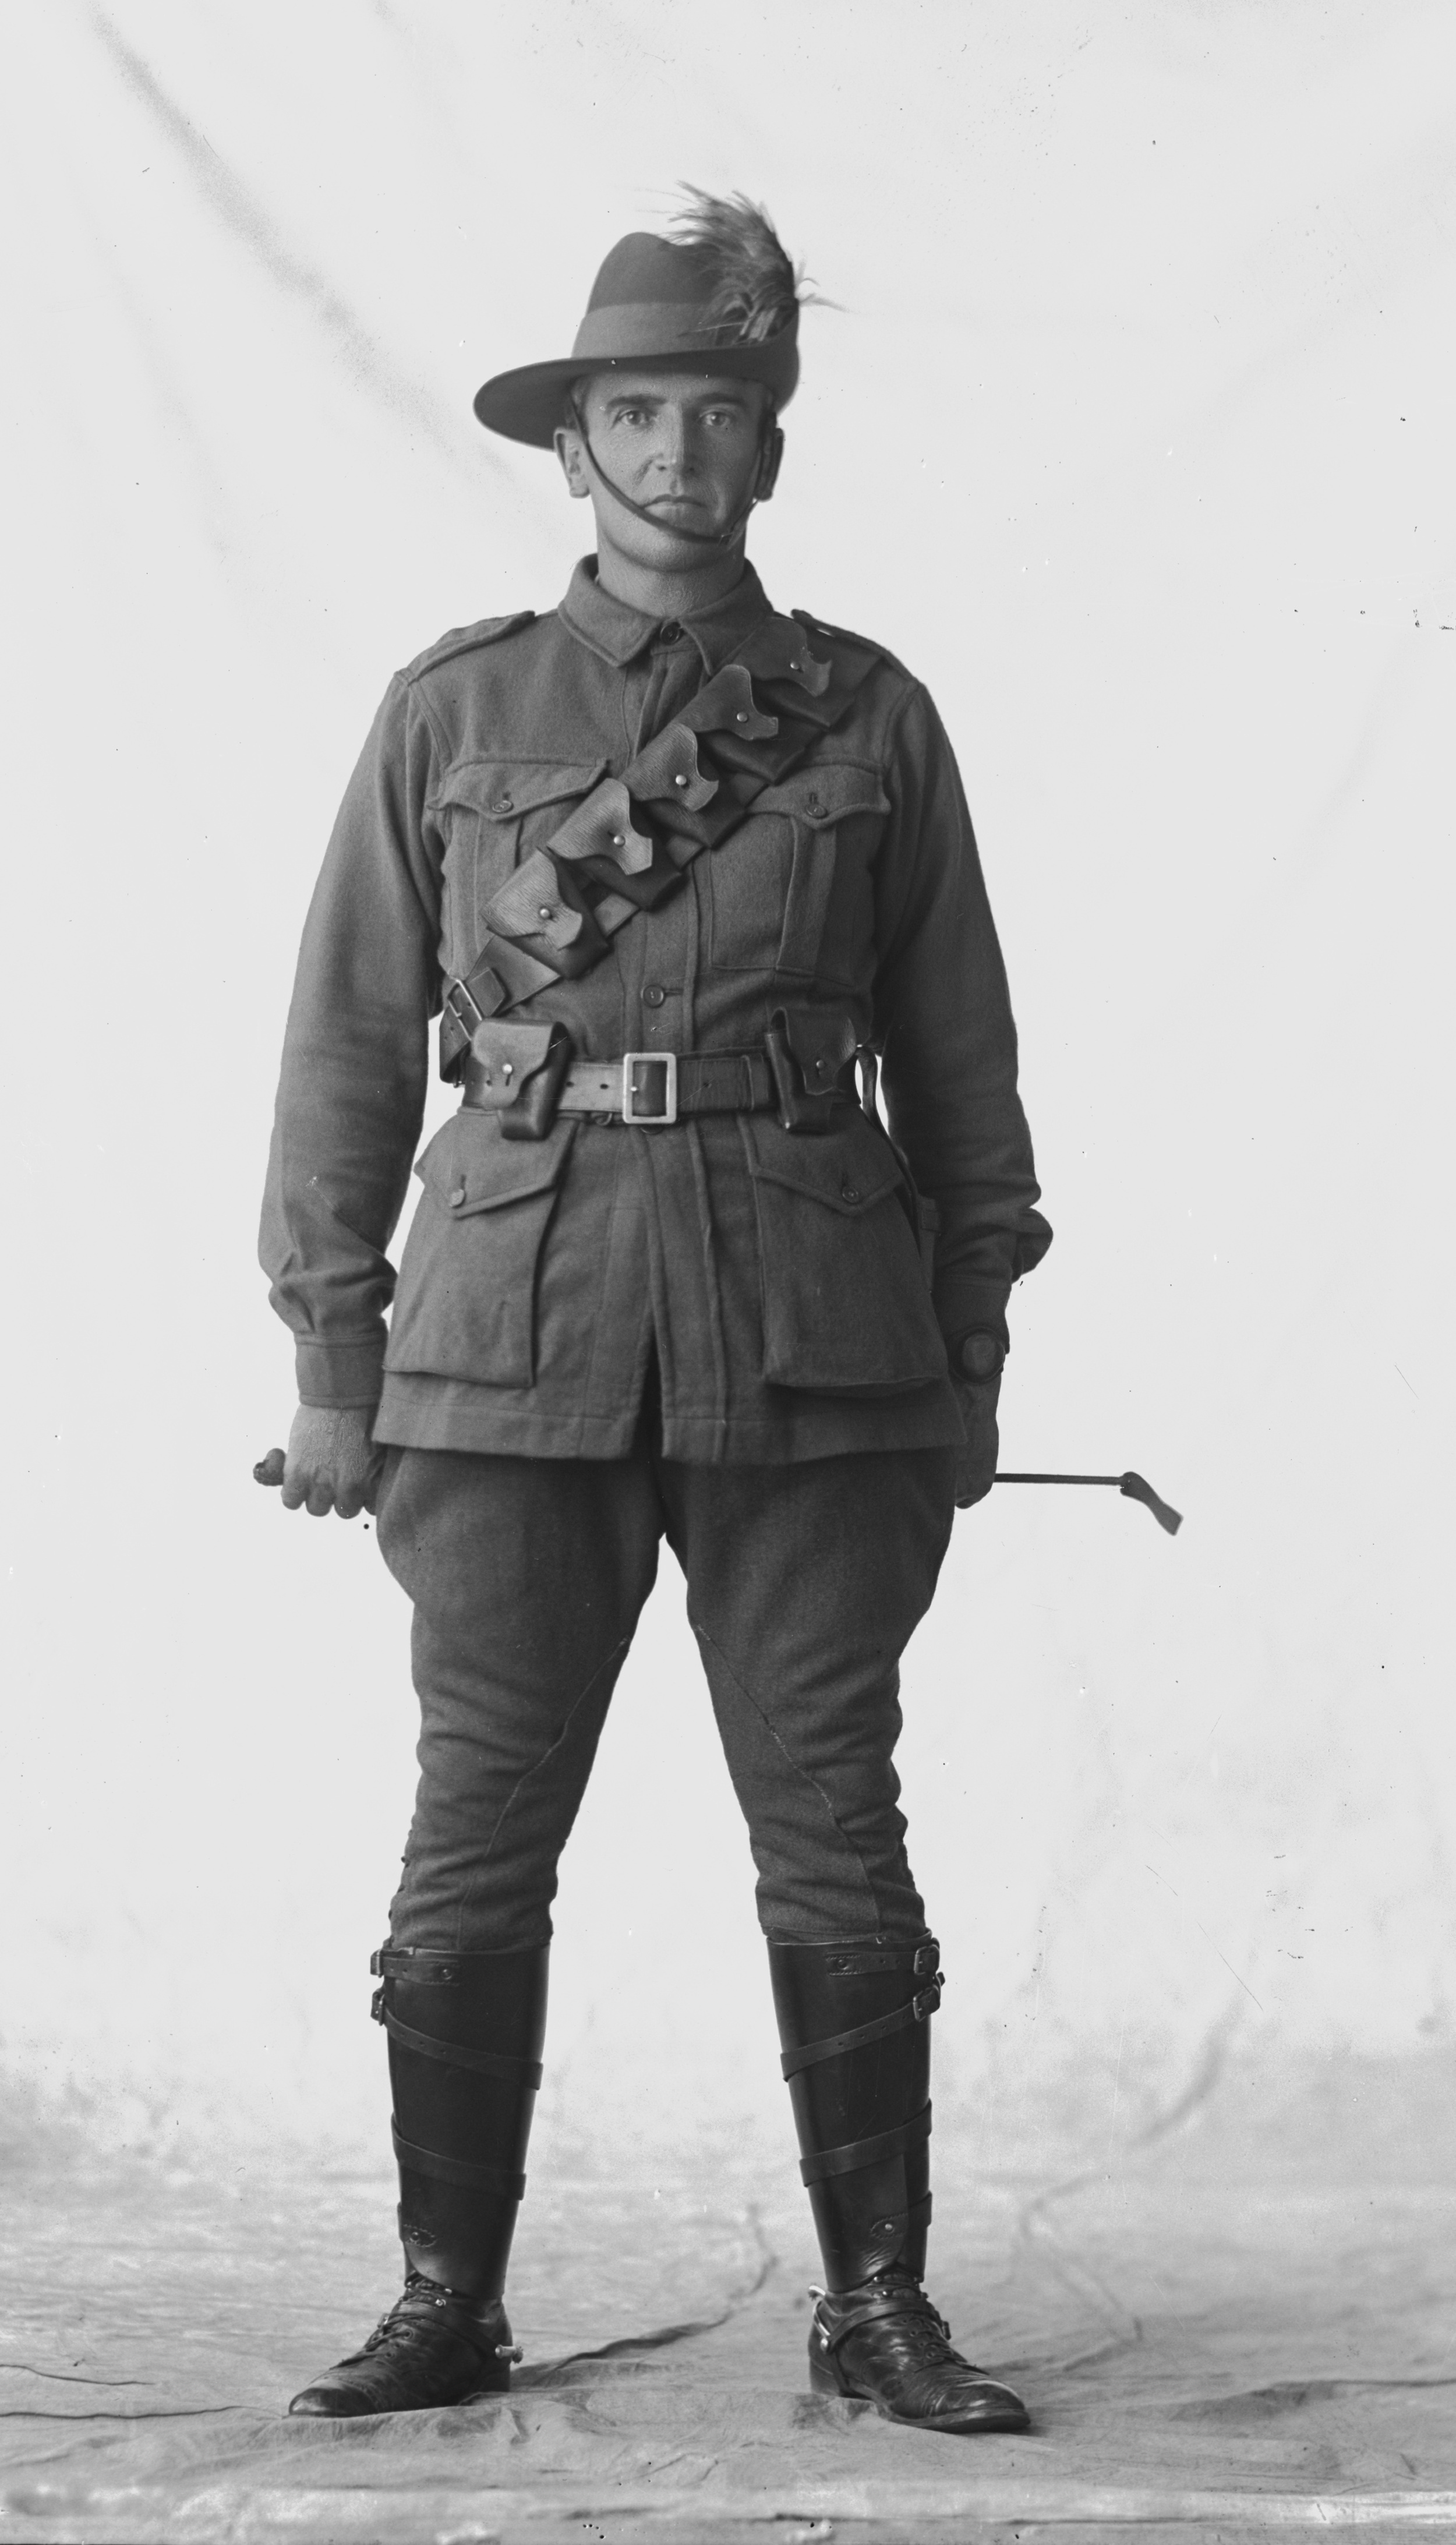 Private Forrest Edward Palmer, 10th light Horse Regiment